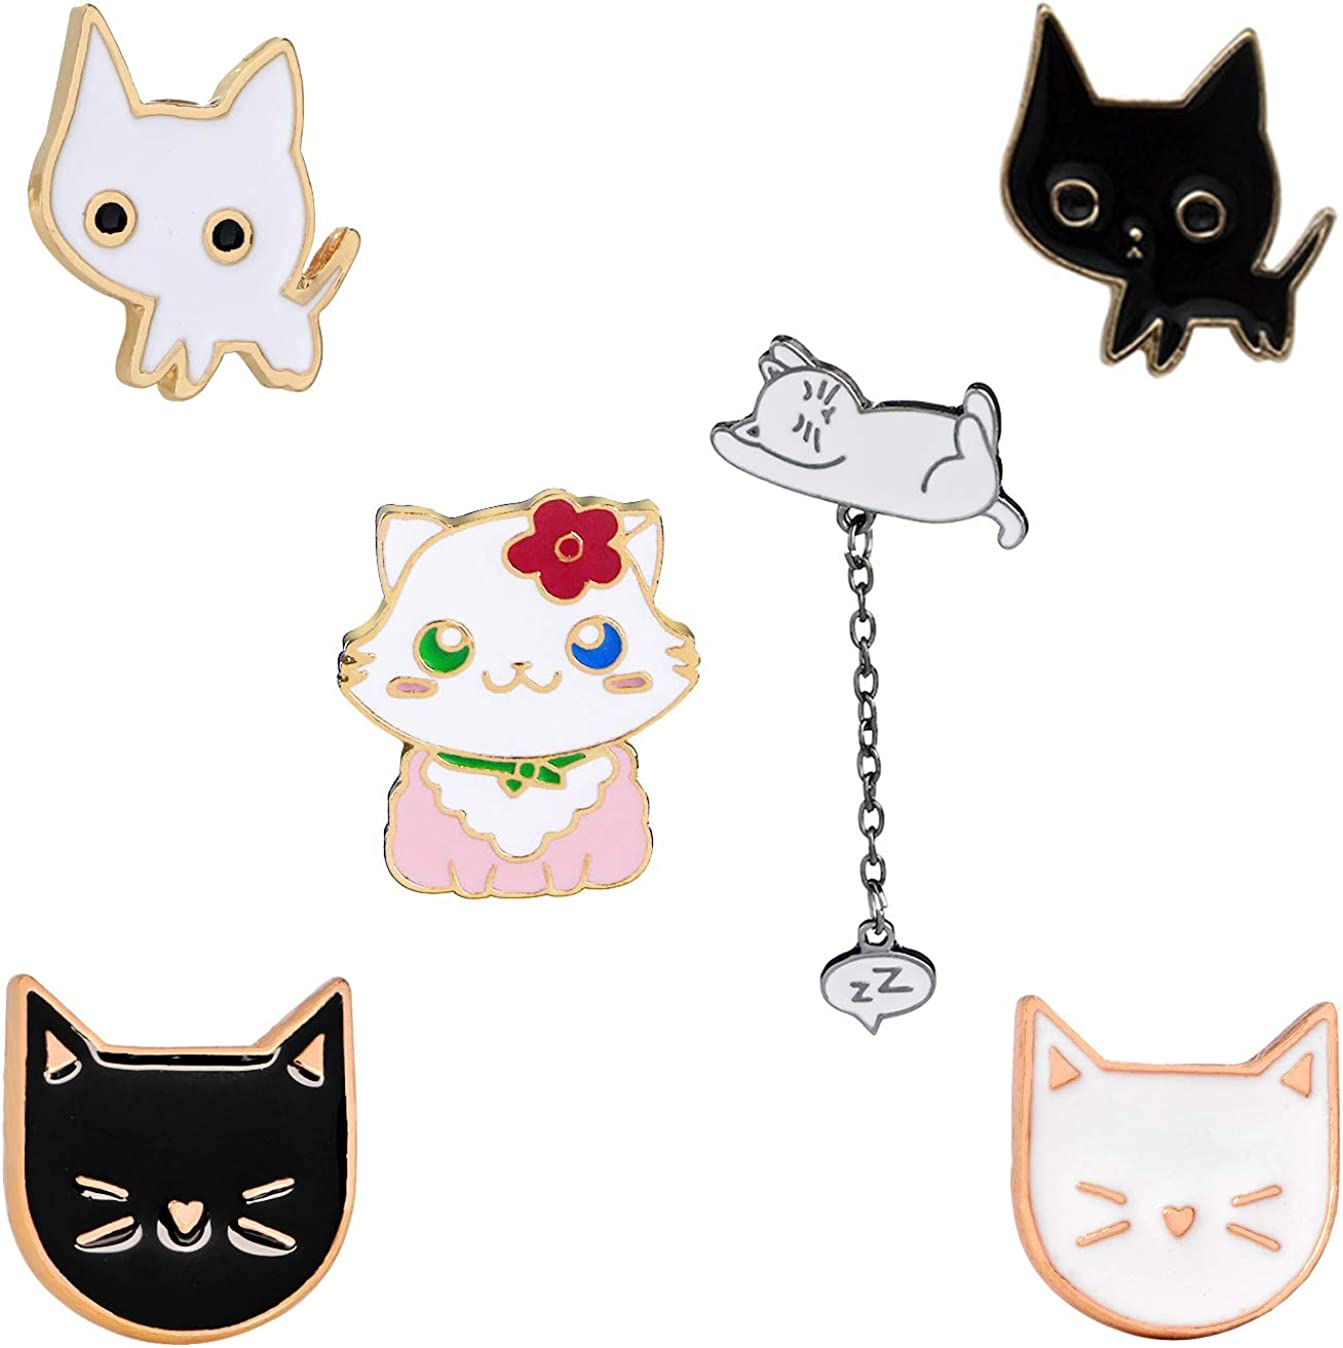 KimYoung Cute Enamel Lapel Pin Sets Carton Animal Brooch Pin (Cat Pin)